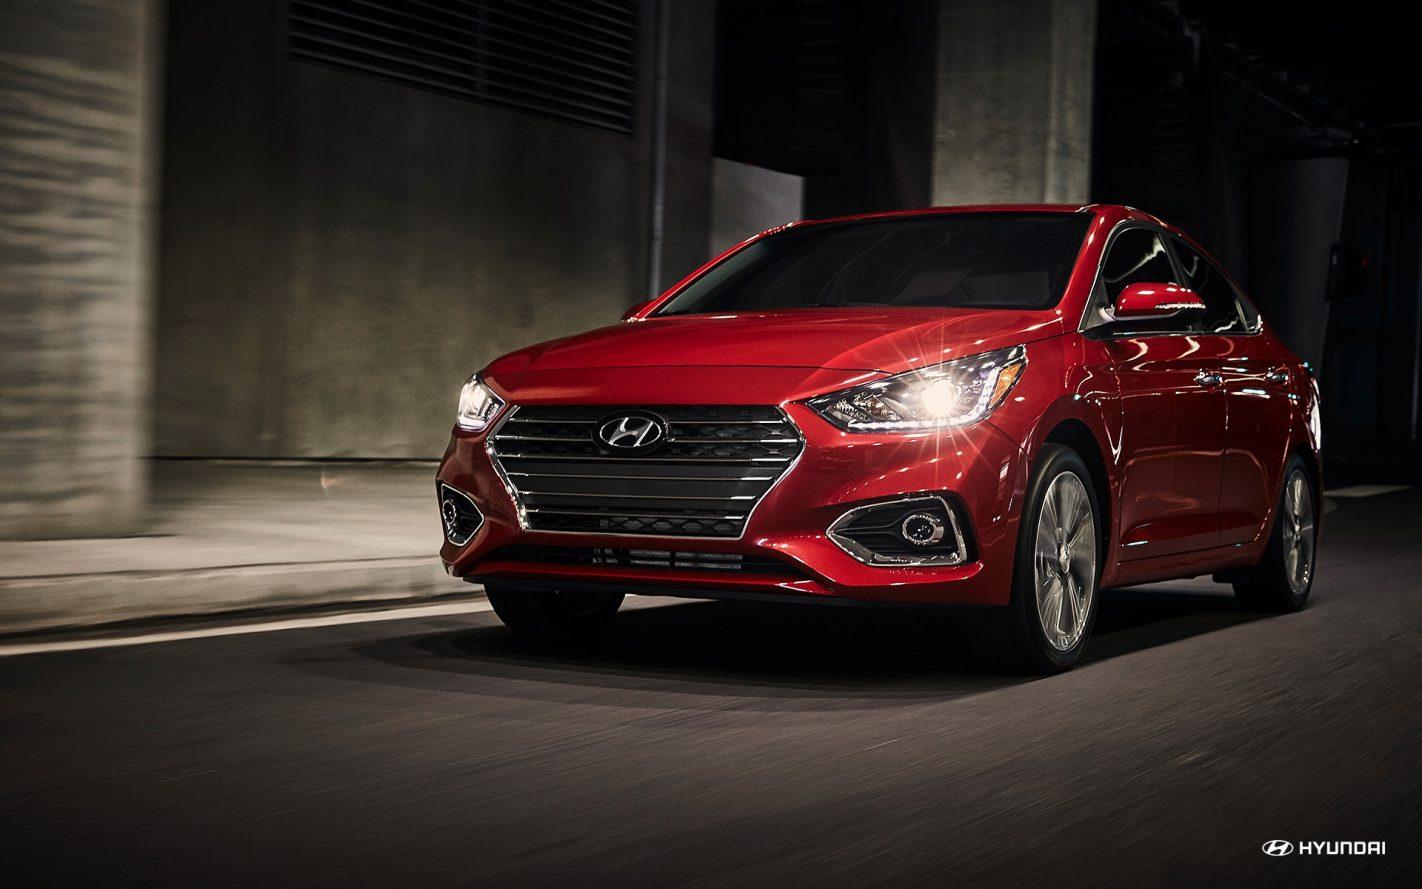 2019 Hyundai Accent Side HD Wallpapers Auto Car Rumors 1422x889